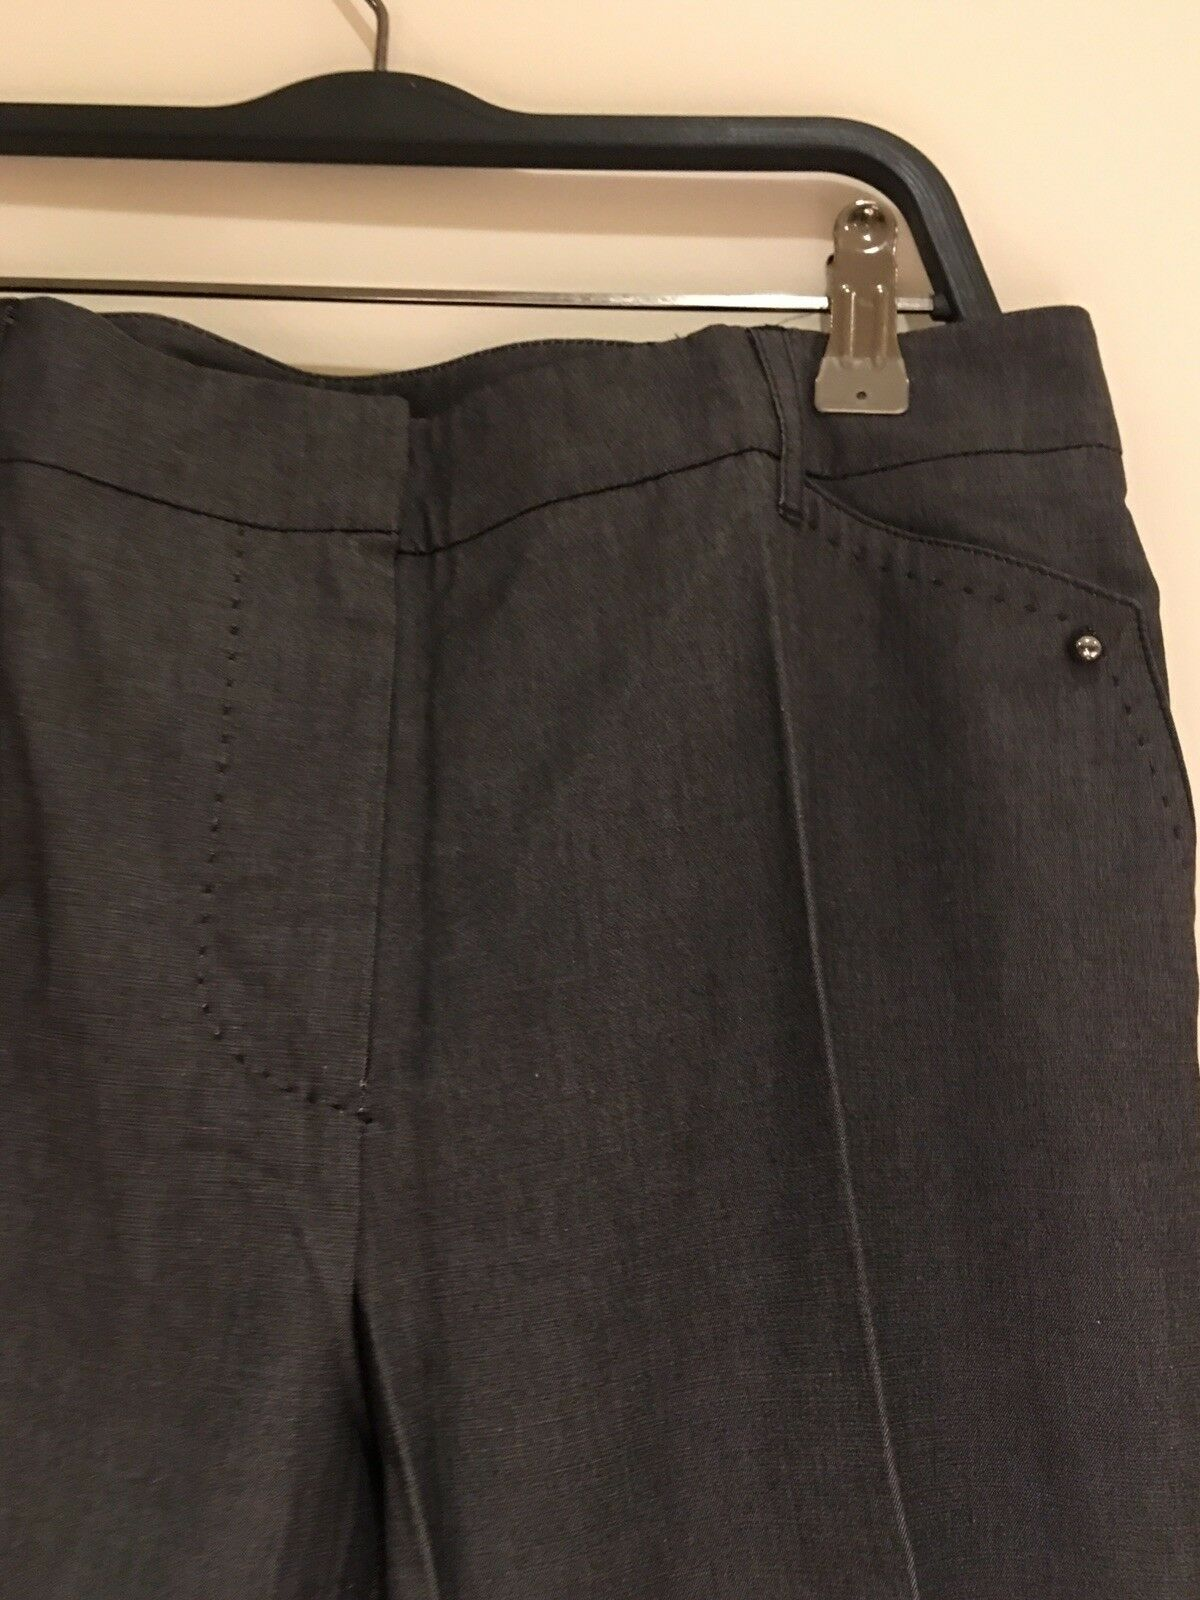 Women's MaxMara Dark Grey  trousers with Elastin. Brand New. UK Size 10.